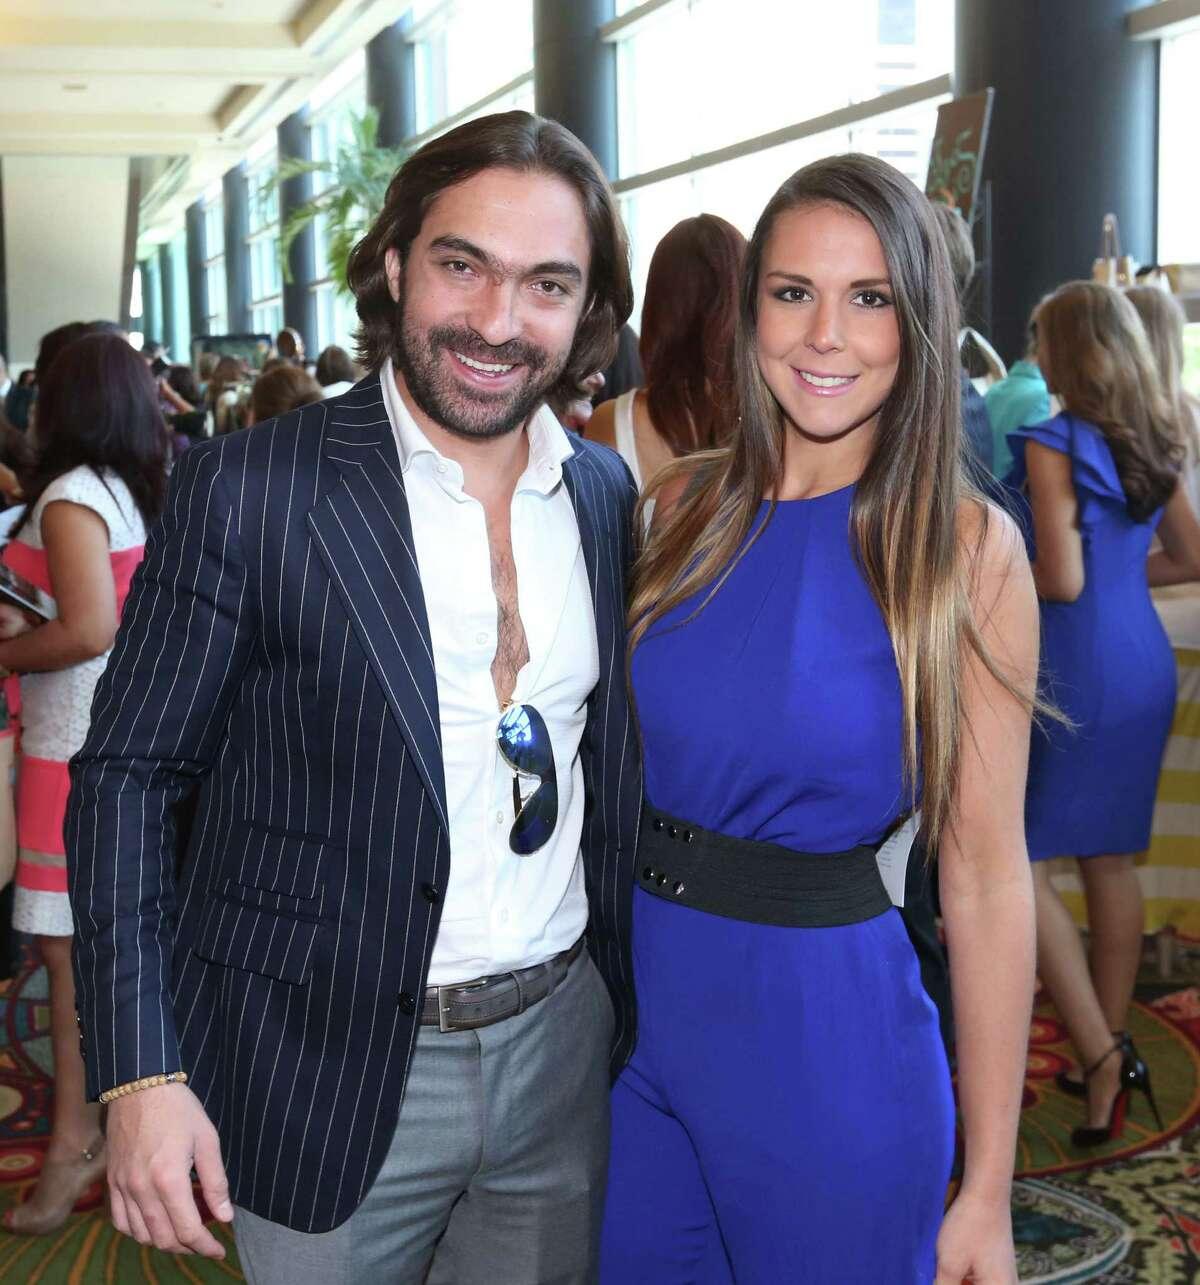 Luis Felipe and Michelle Morlet